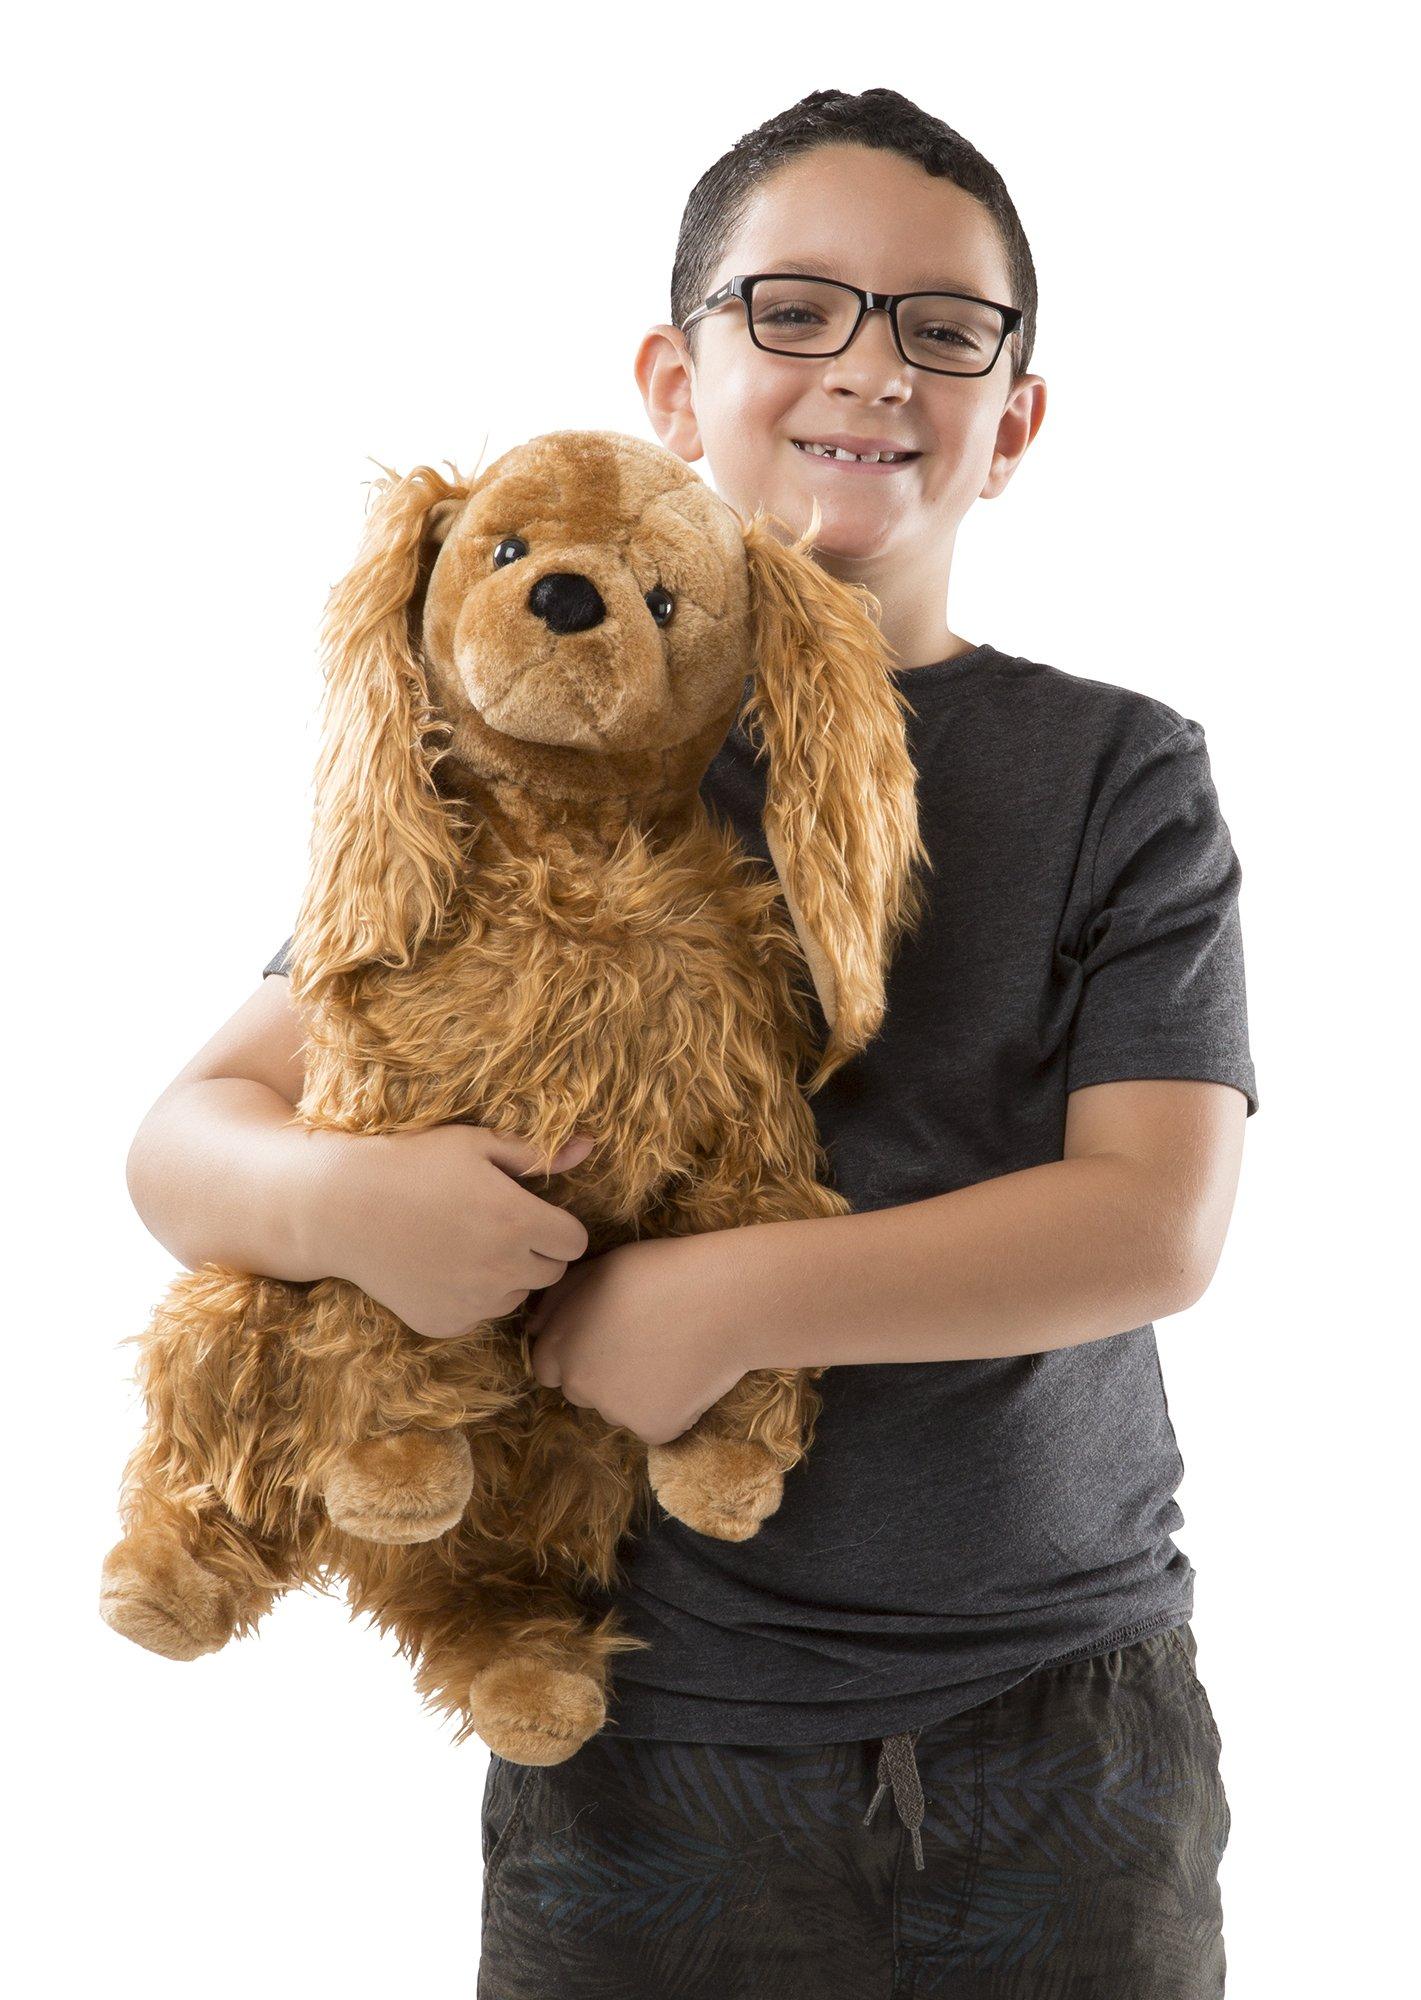 Melissa & Doug Giant Cocker Spaniel  - Lifelike Stuffed Animal Dog by Melissa & Doug